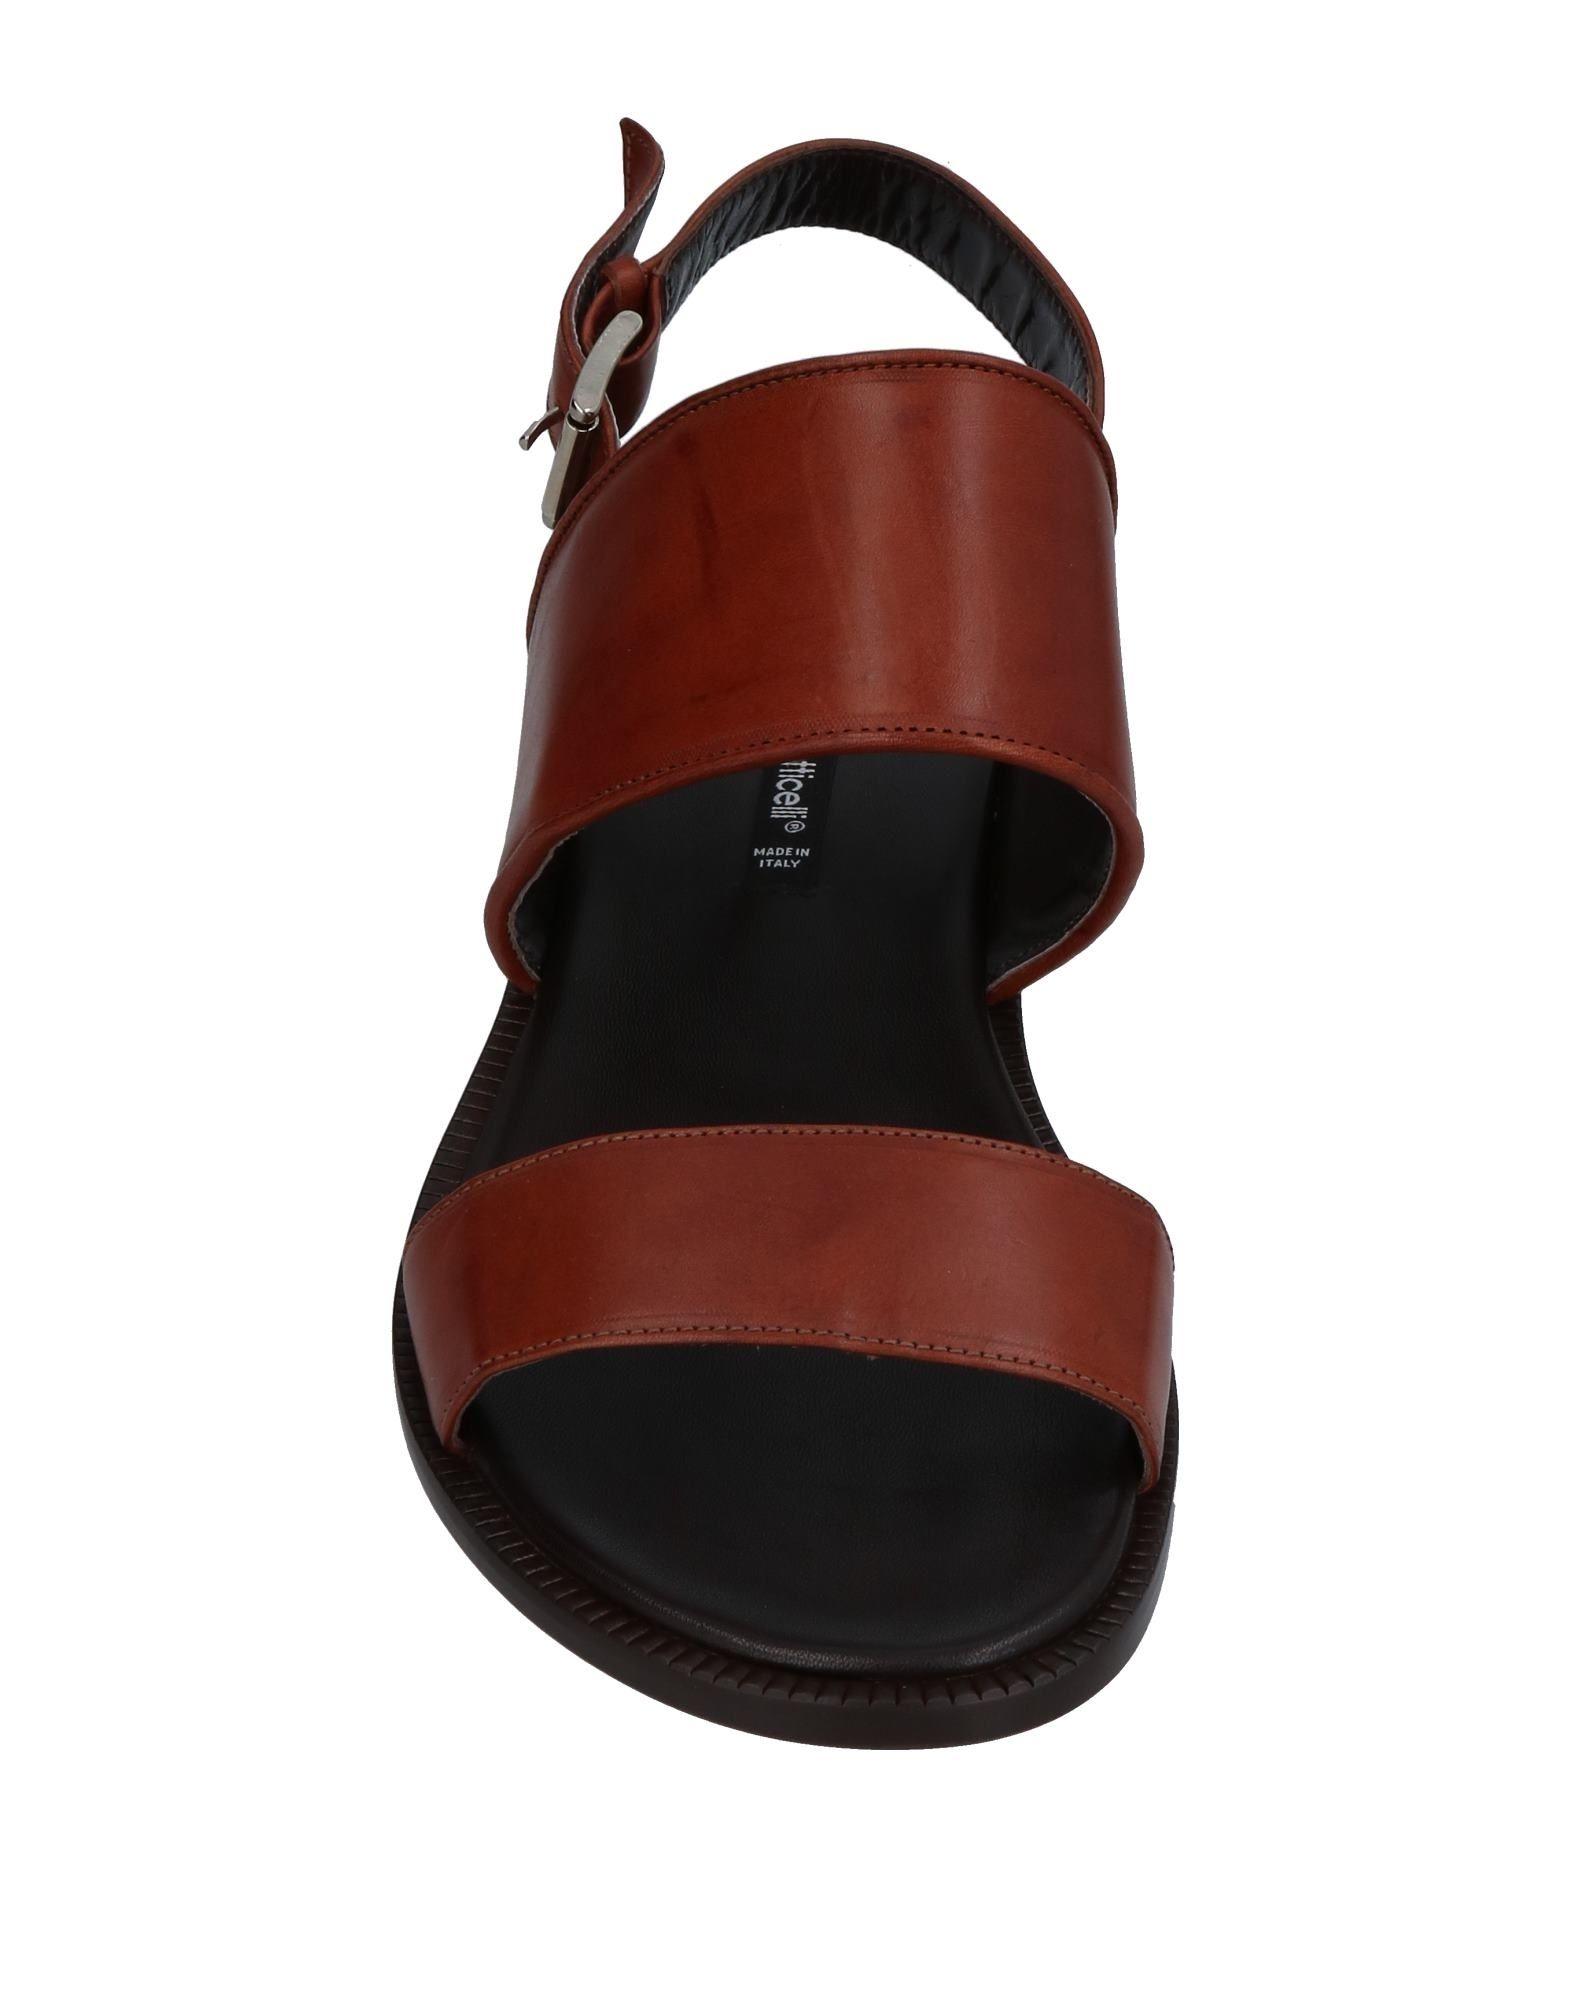 Chaussures - Tribunaux Roberto Botticelli MgyyO8qBo